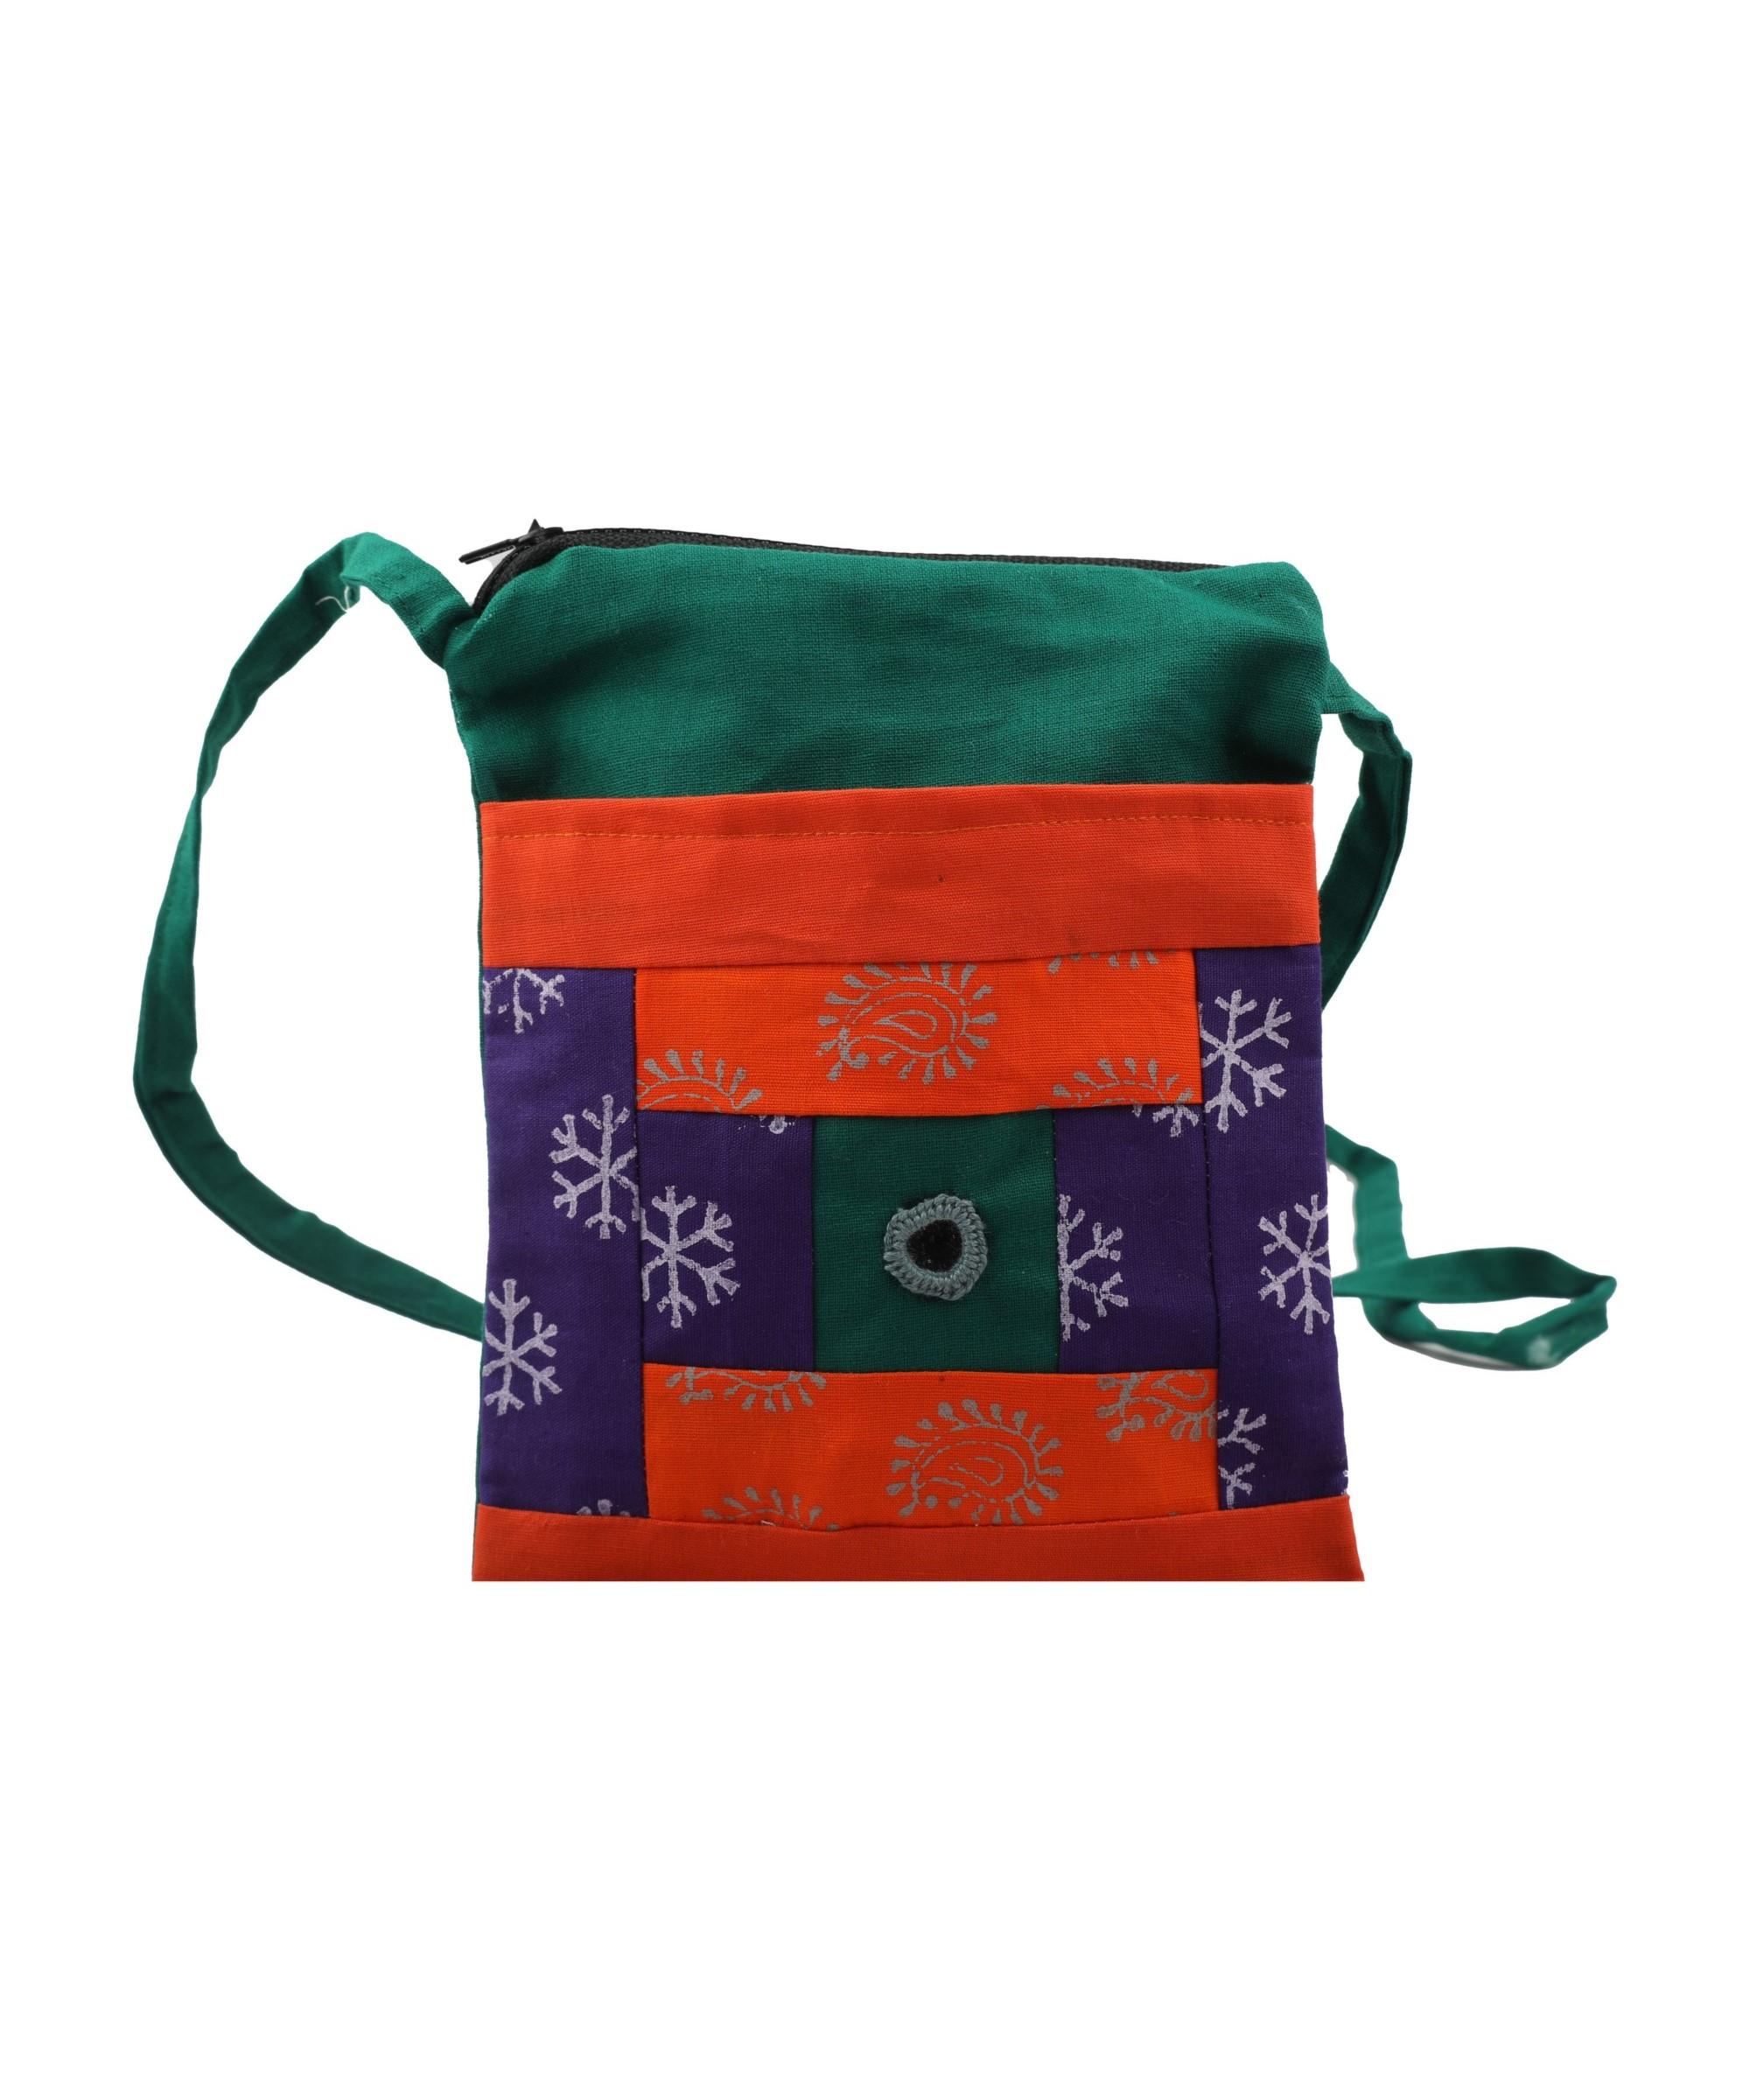 WIEA Dusky Bright Sling Bag (Set of 2)